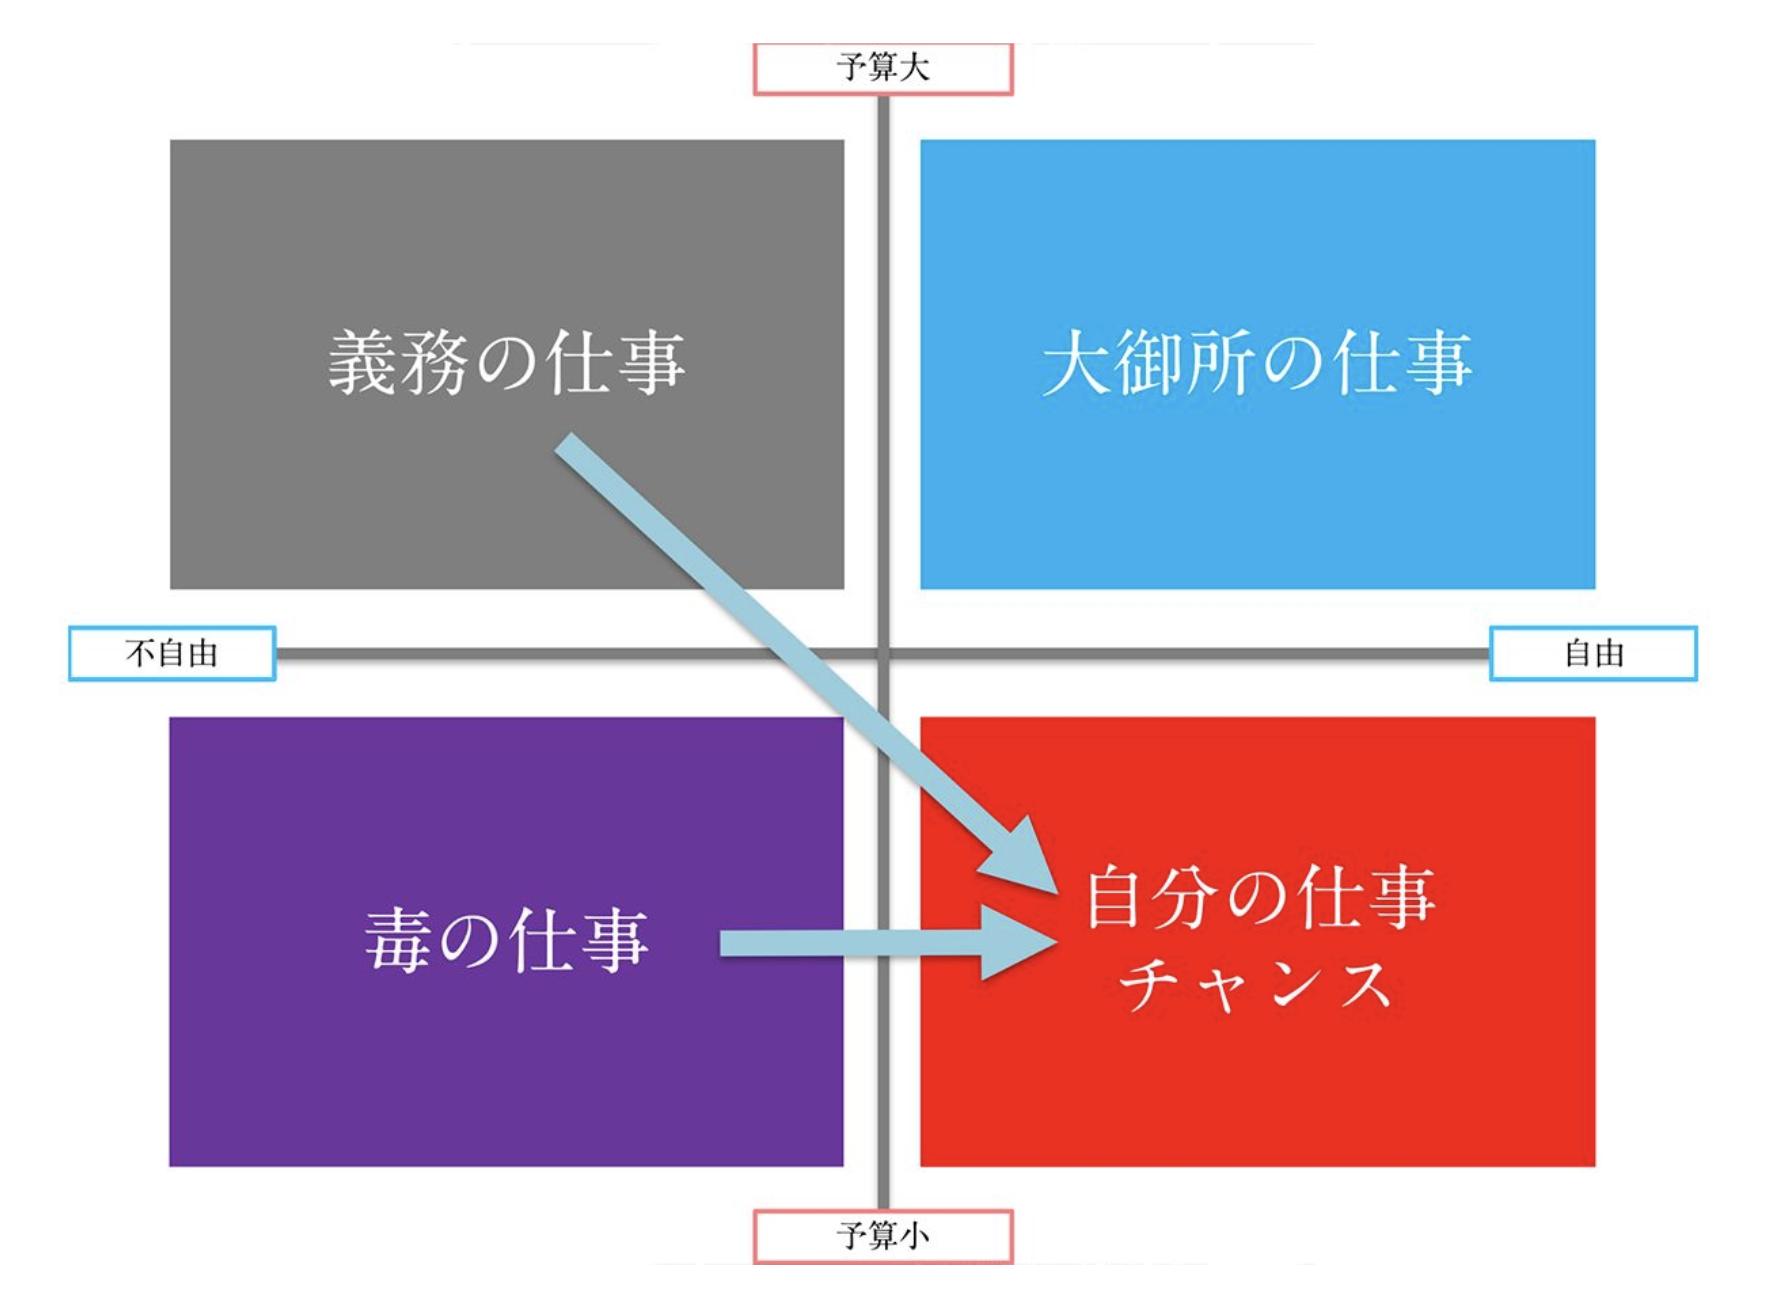 =【MEETSCAREER(ミーツキャリア)】仕事の分類マトリクスの画像